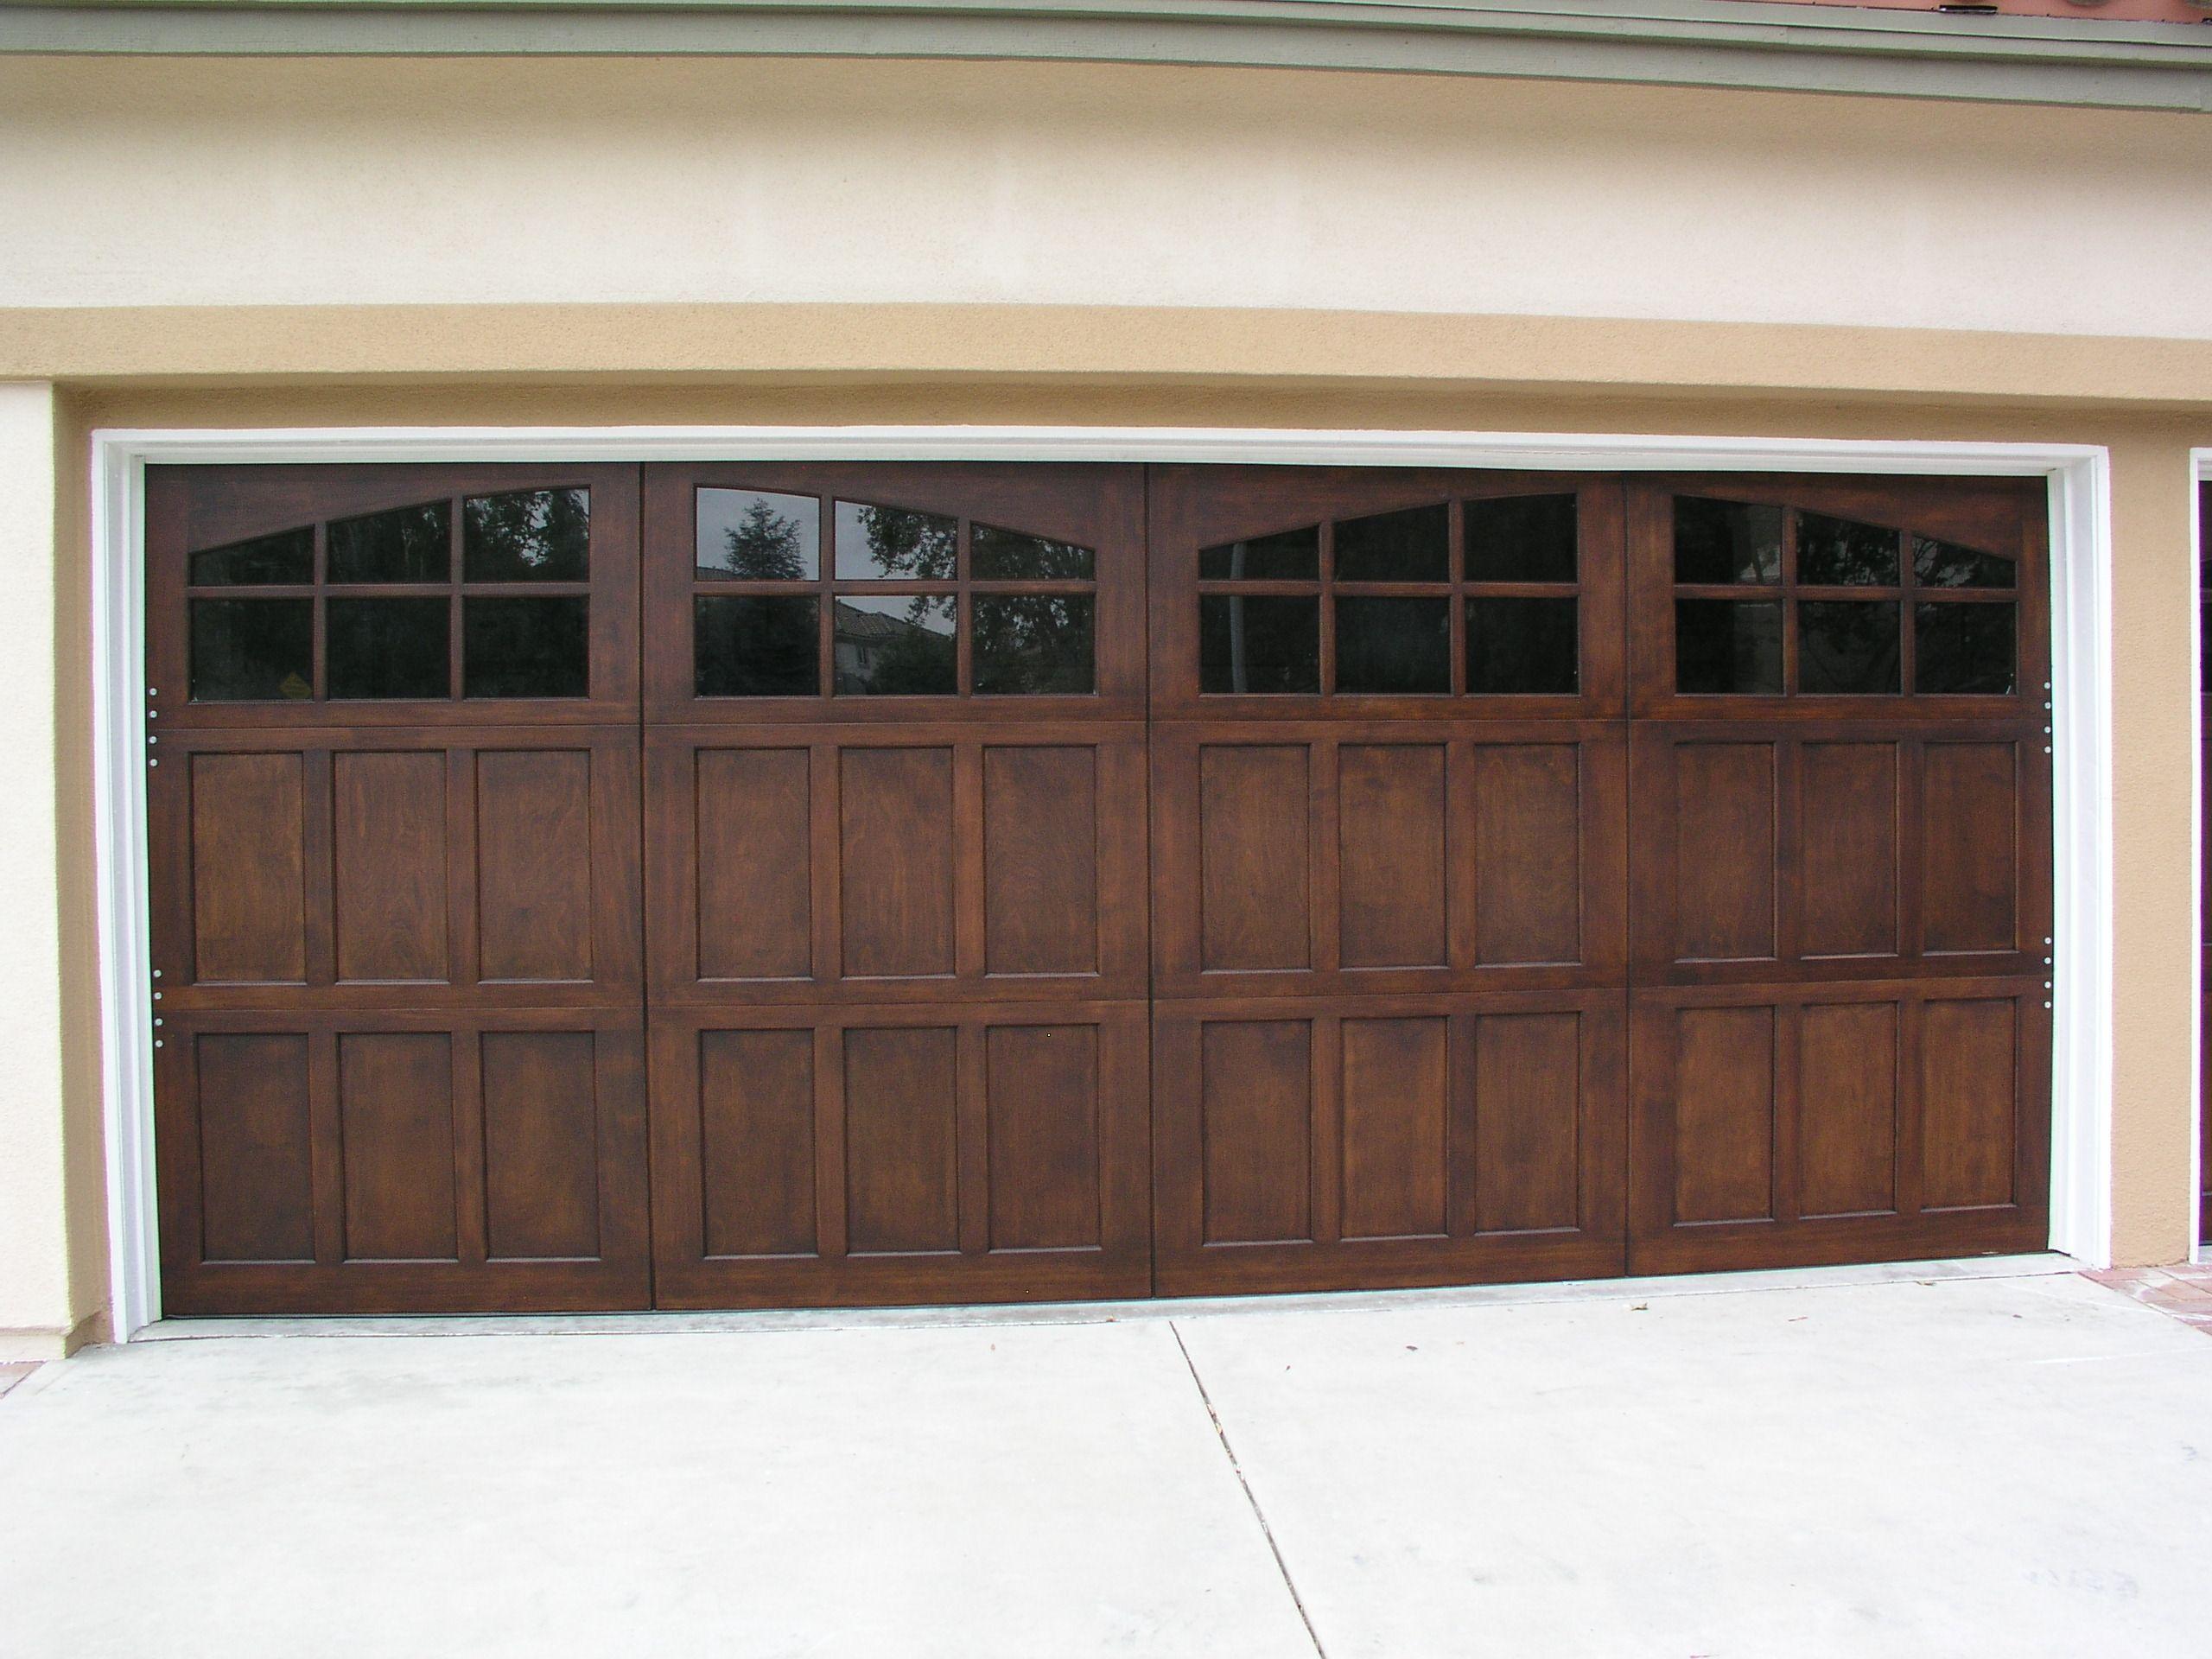 Wayne dalton 9700 garage doors - Beautiful Wayne Dalton 9700 Walnut Garage Door Los Angeles Ca Photo Credit Agi